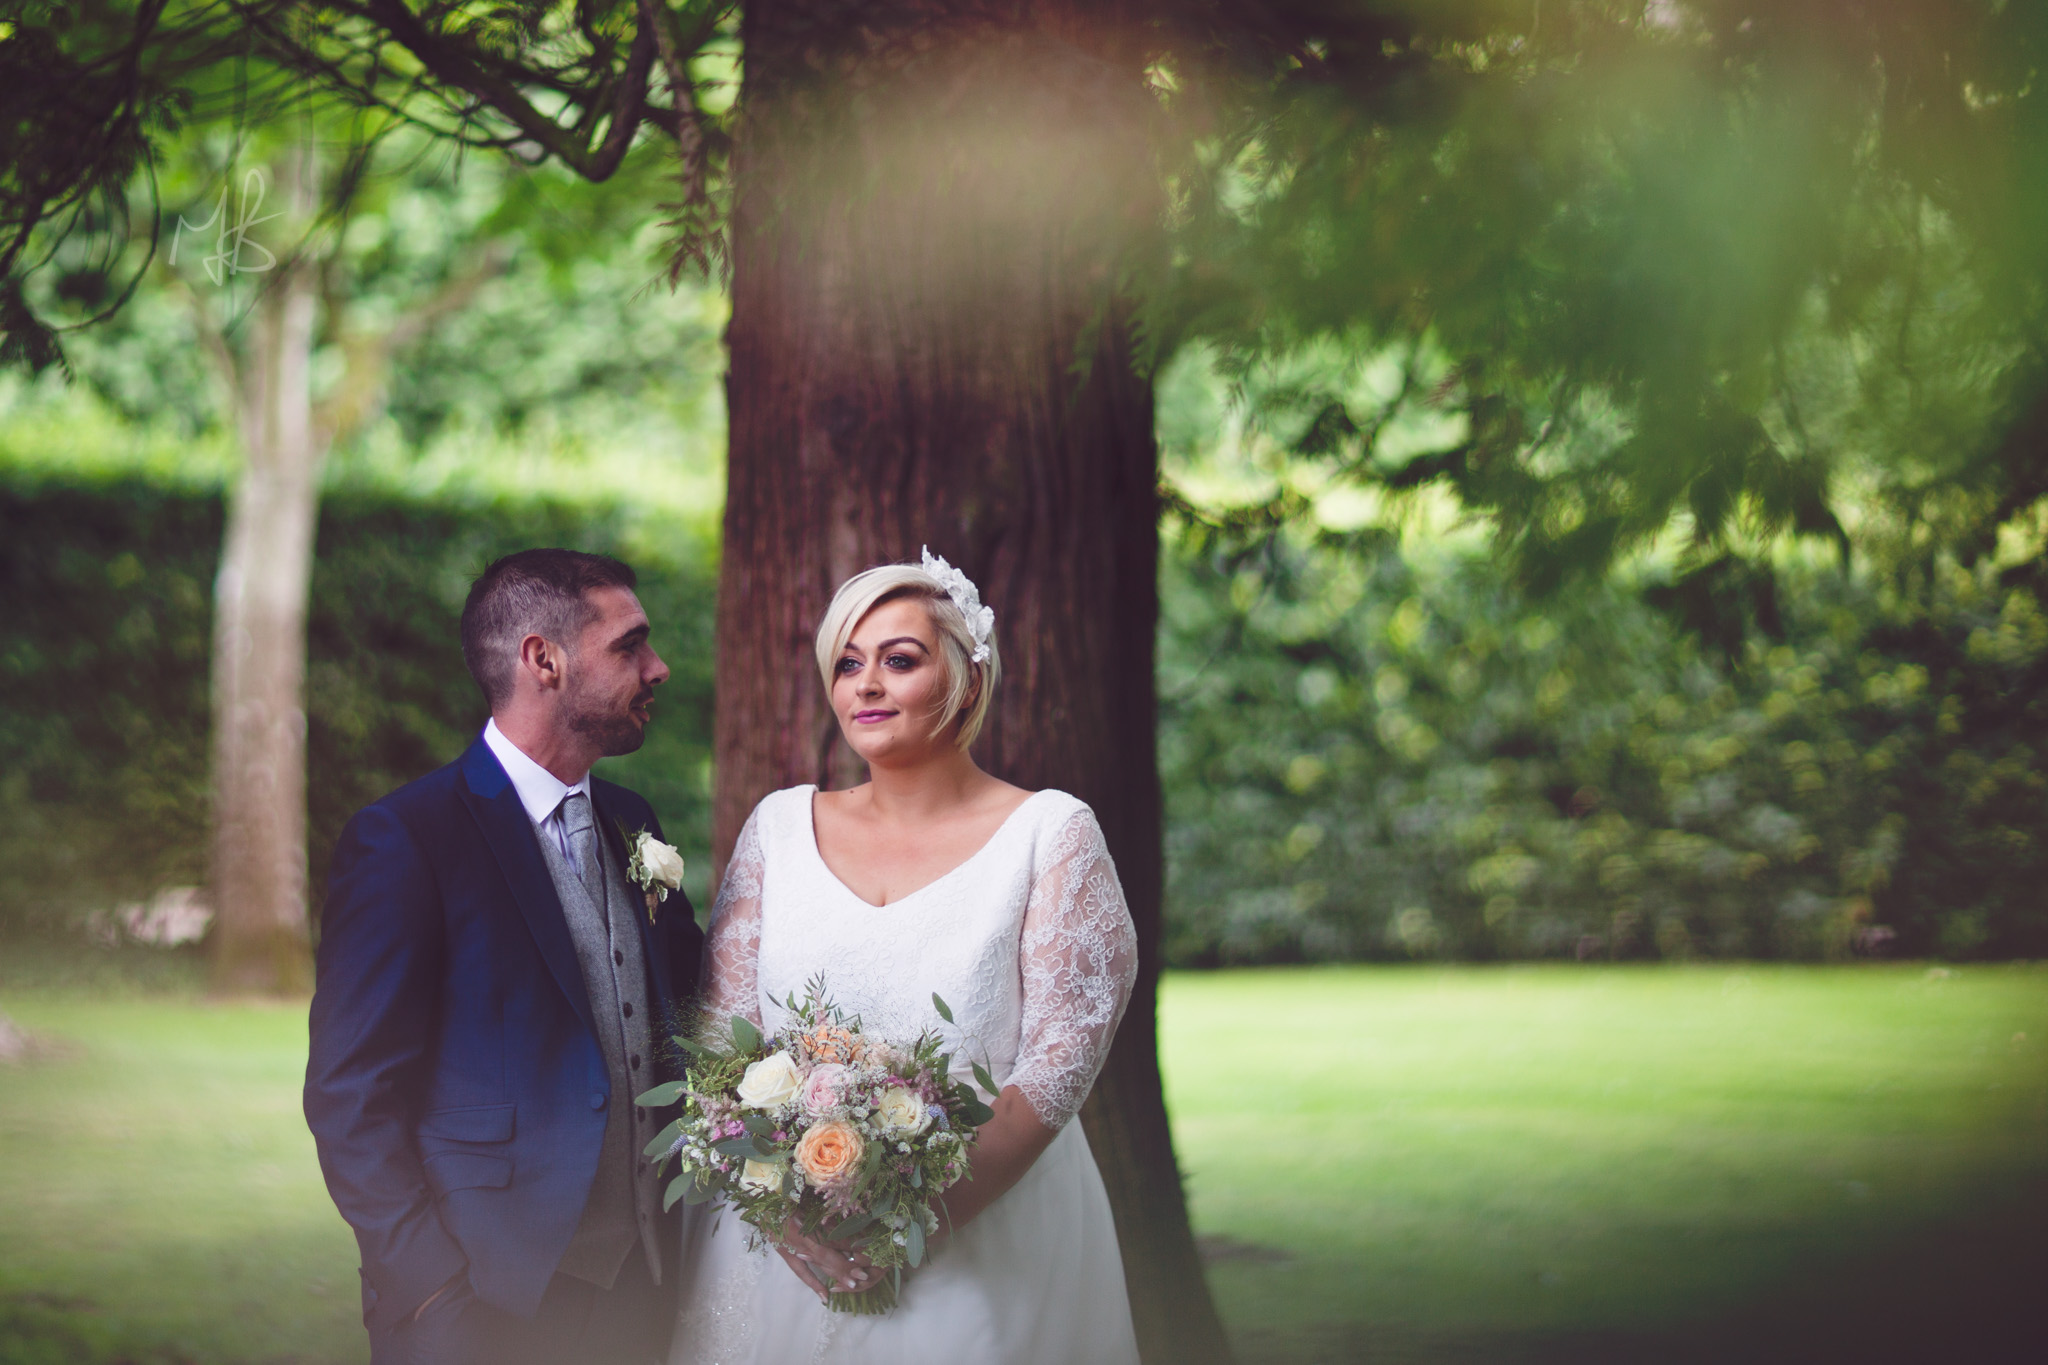 Northern-Ireland-Wedding-Photographer-Mark-Barnes-Ballymena_wedding-photography-Leighinmohr-House-Seamas_Alanna_For-web-36.jpg